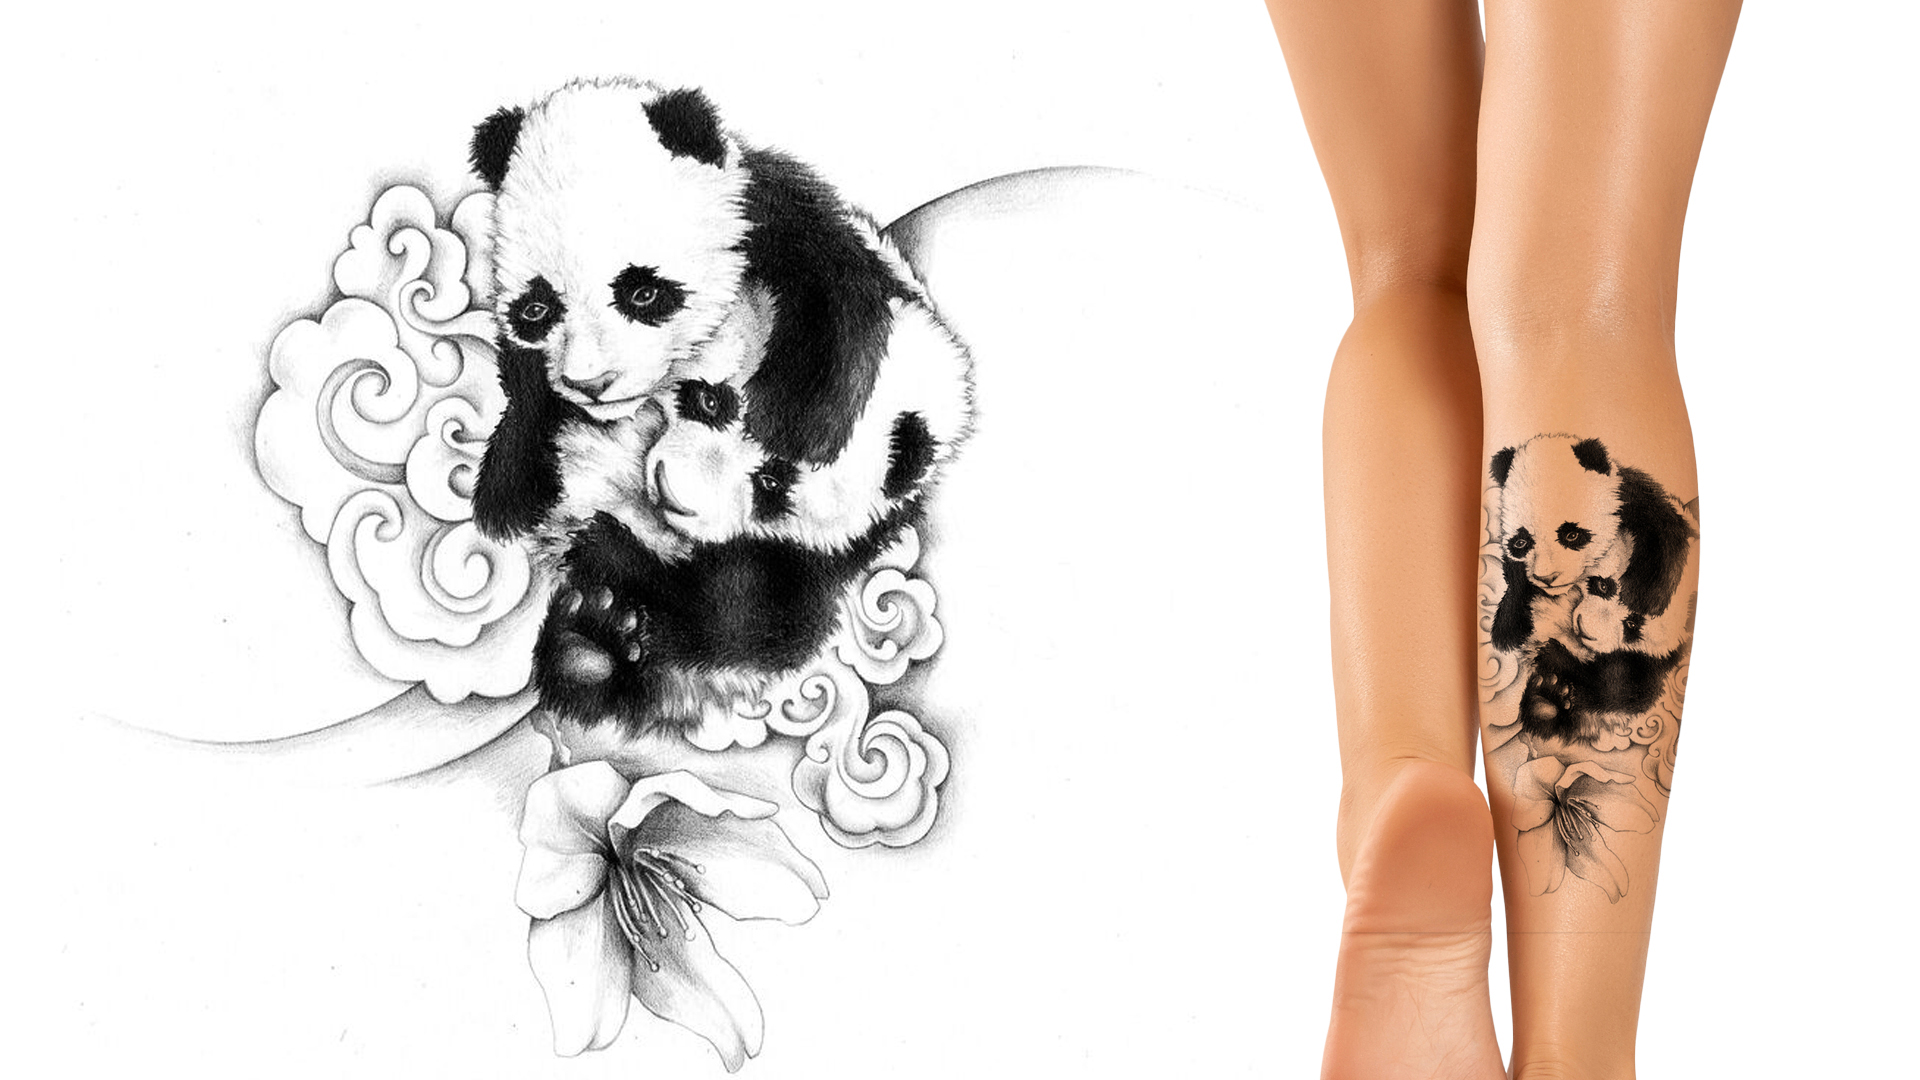 Columbus Custom Tattoo Designs: Get Custom Tattoo Designs Made Online